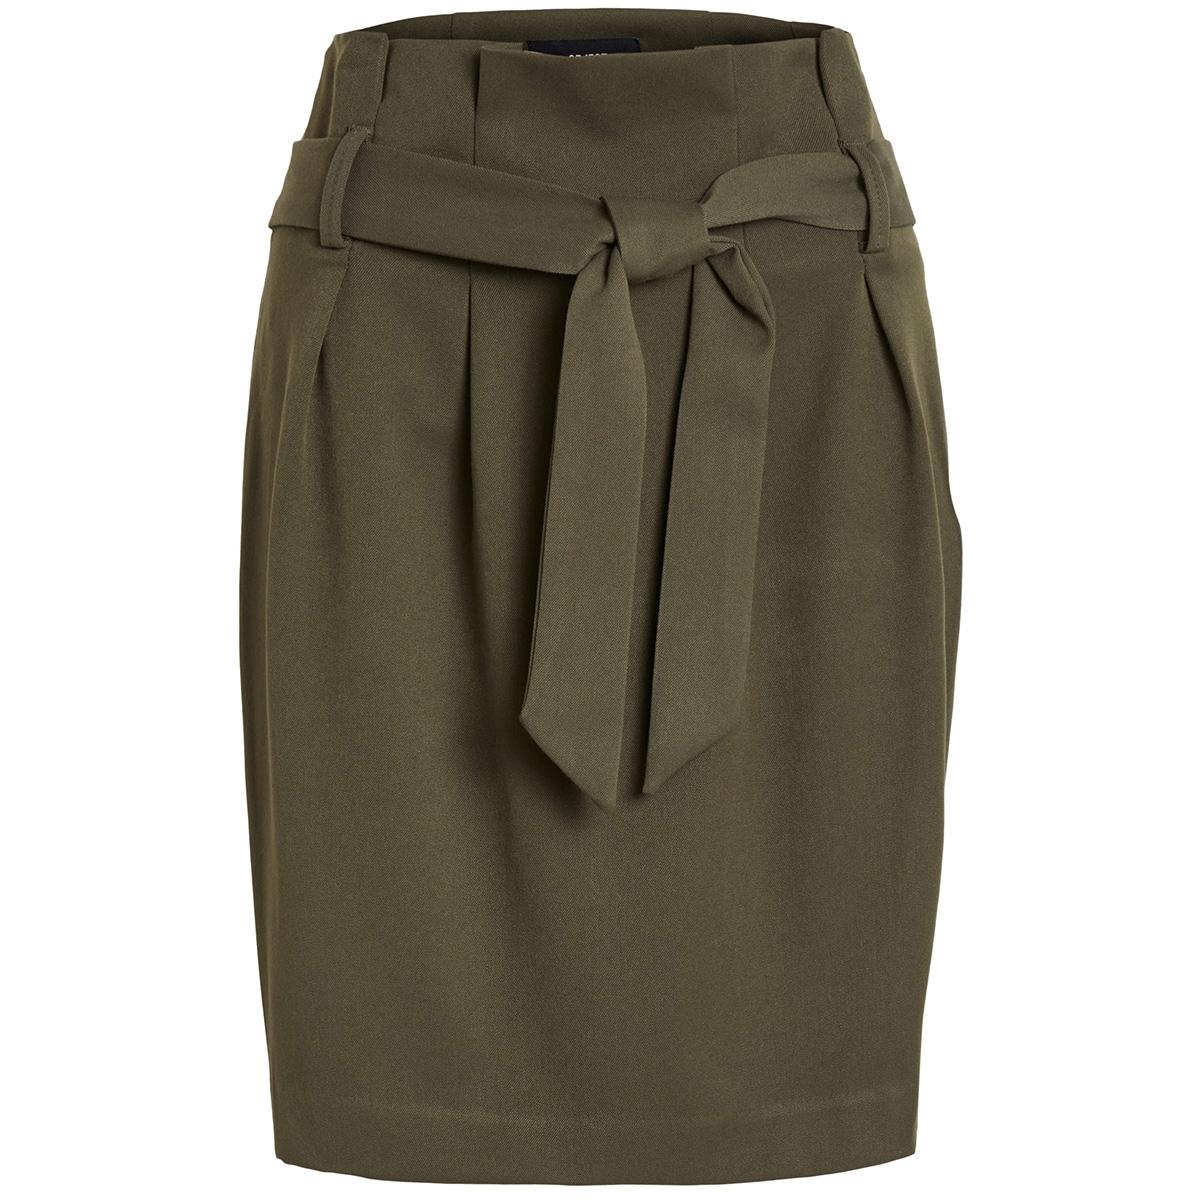 objlisa abella mini skirt noos 23030173 object rok forest night